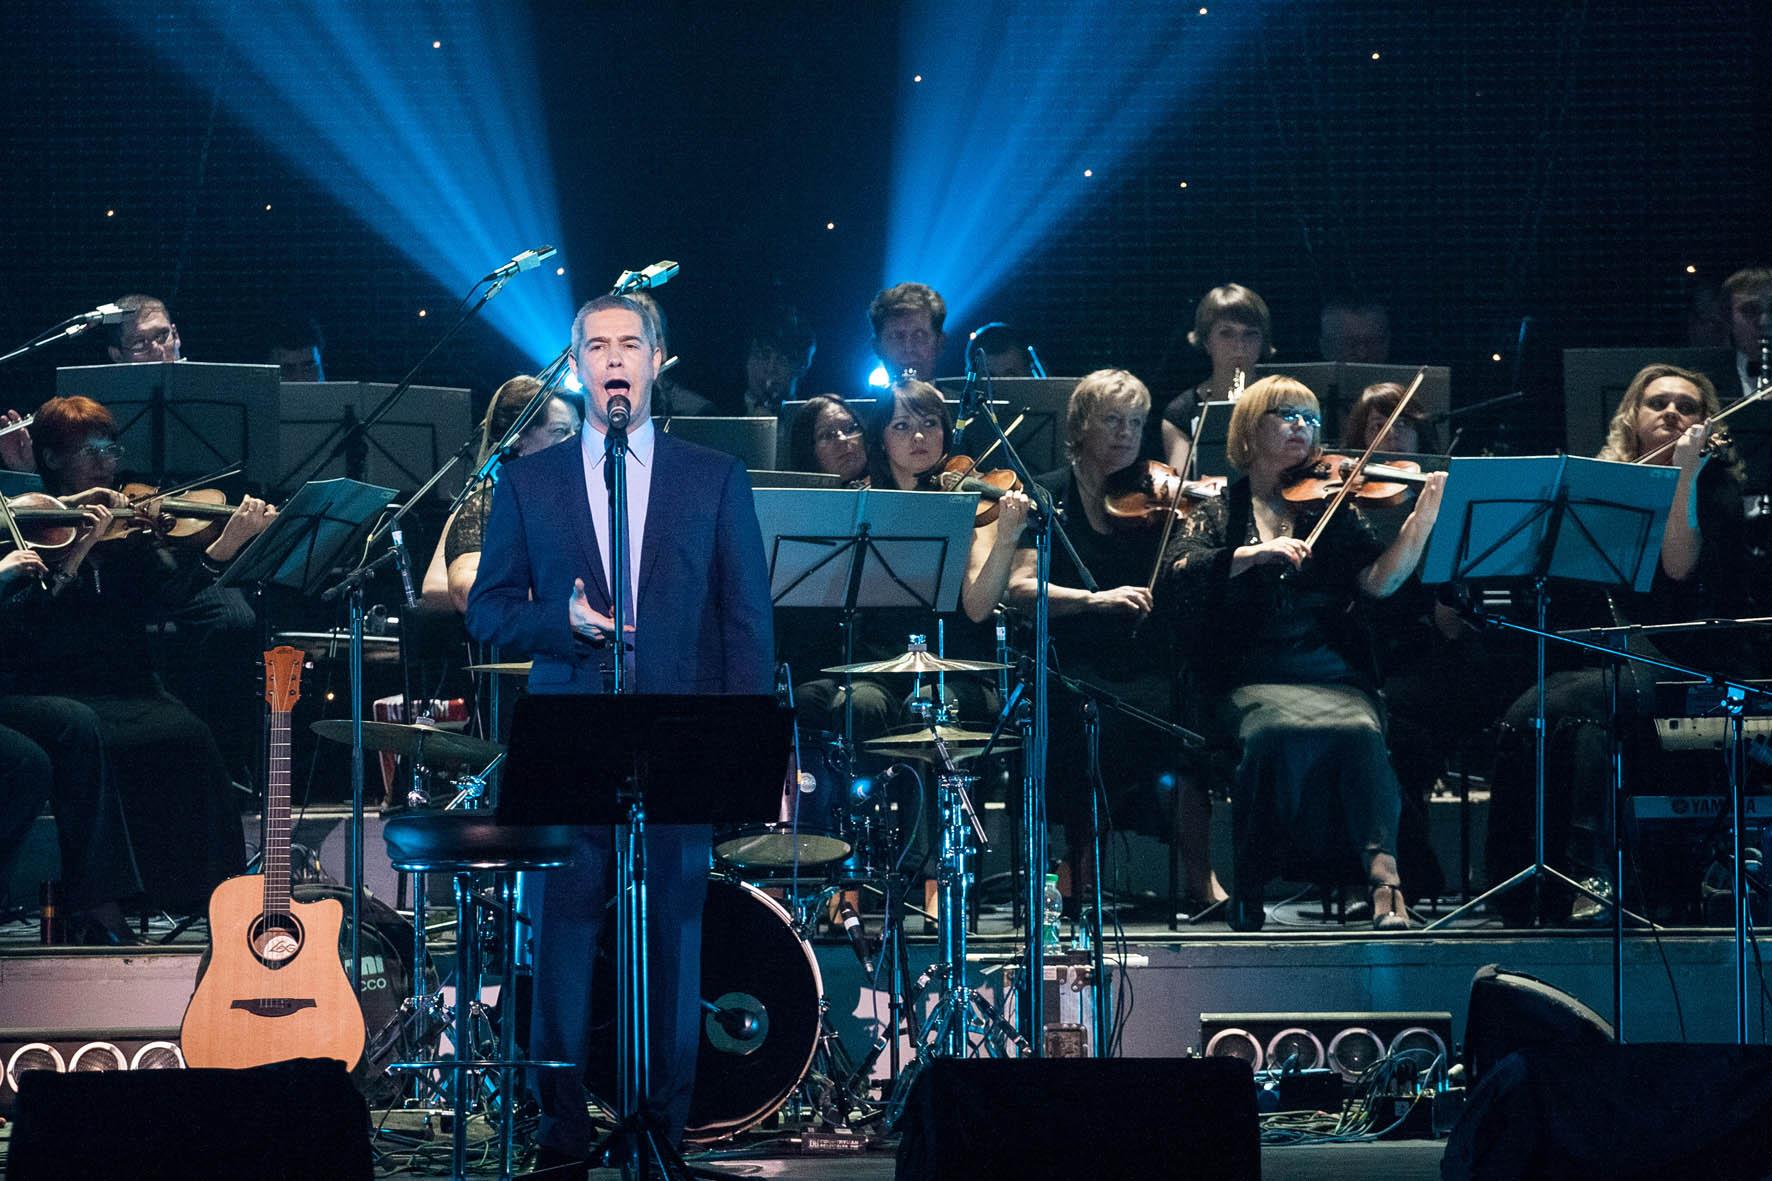 Концерт Алессандро Сафина в Киеве состоится 6 марта 2018 года